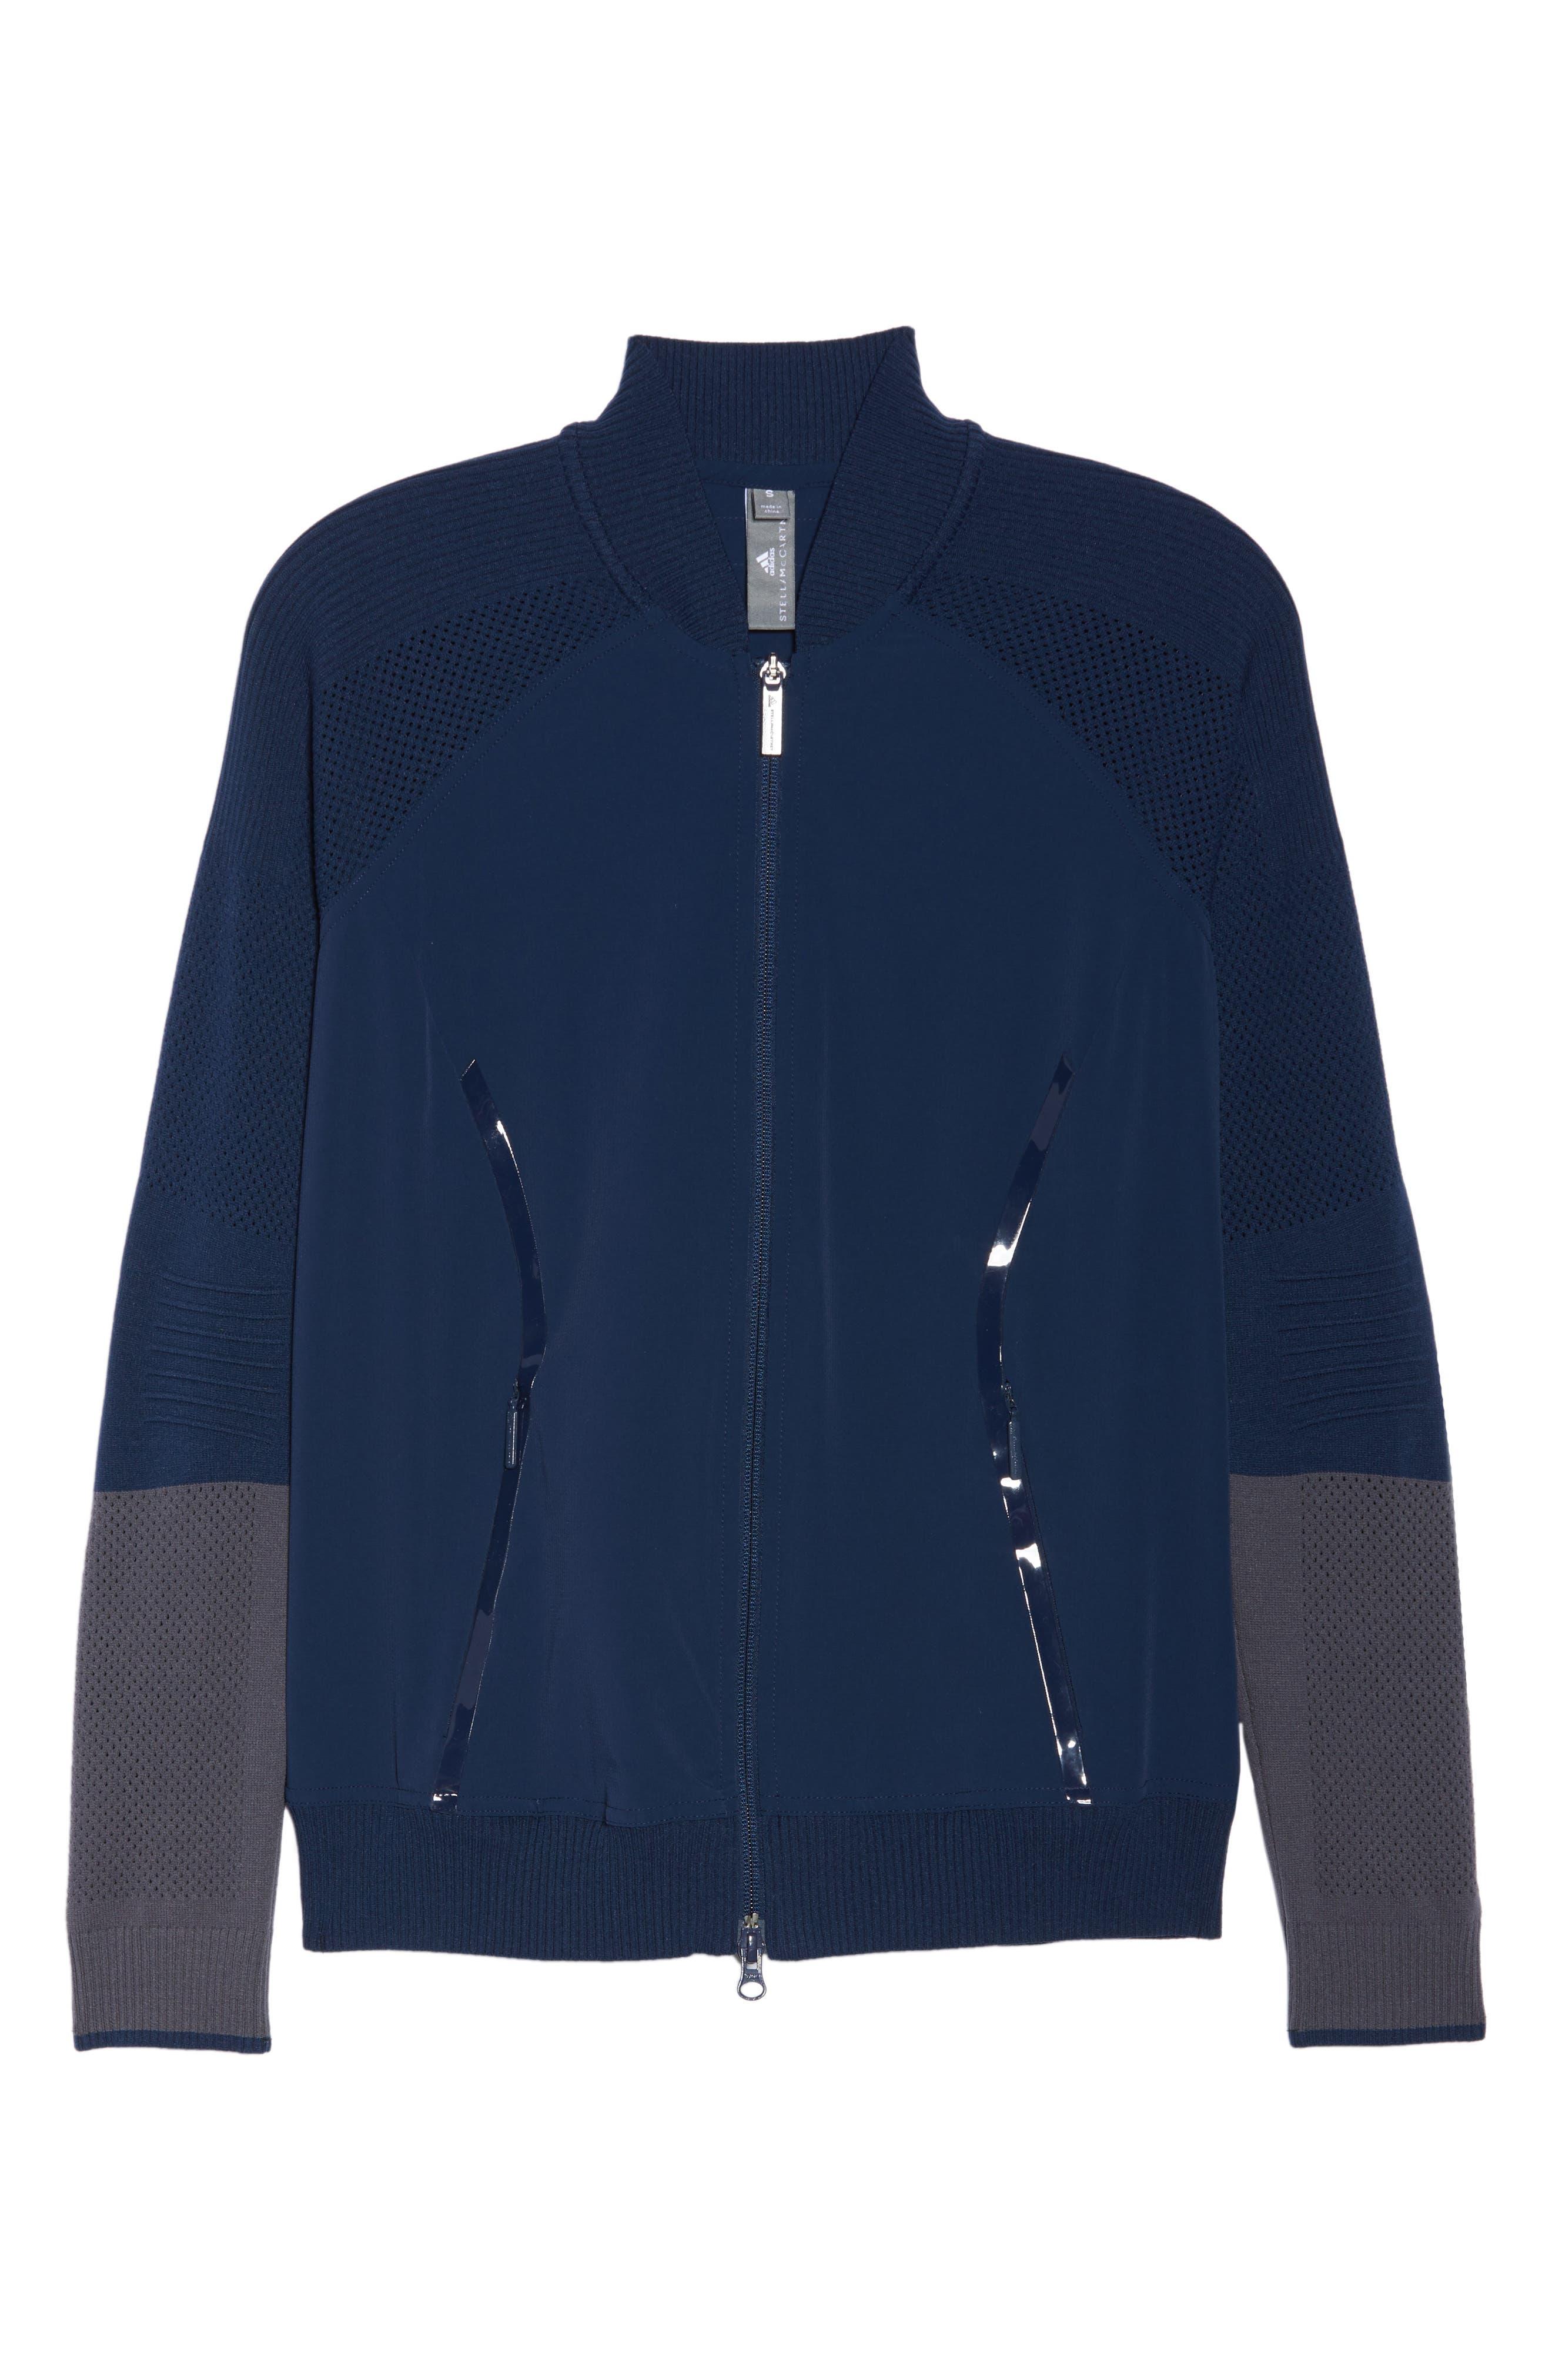 Run Ultra Knit & Woven Jacket,                             Alternate thumbnail 7, color,                             Collegiate Navy